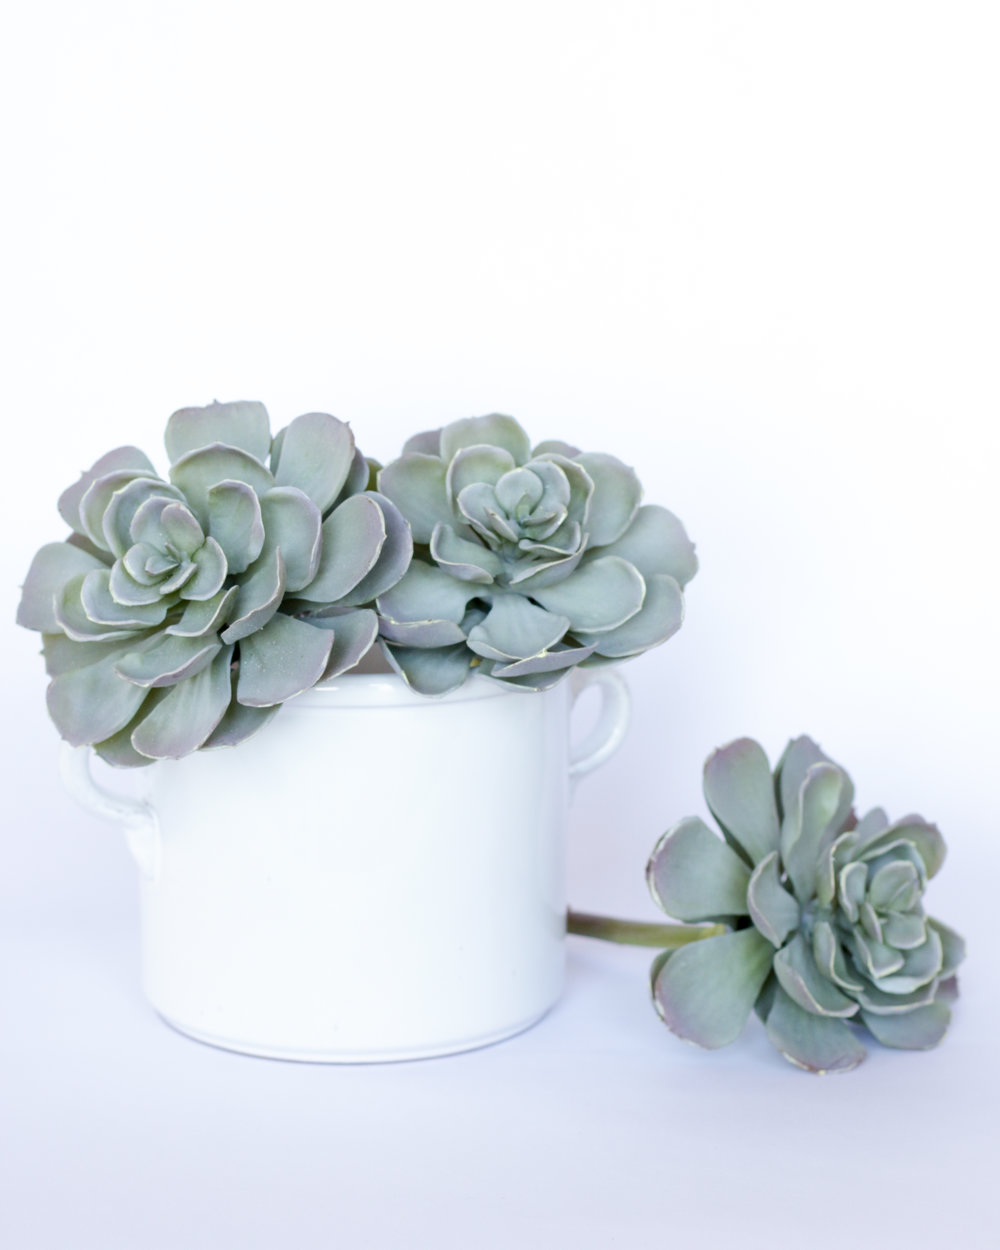 Succulent with Stem — Spruce, LLC